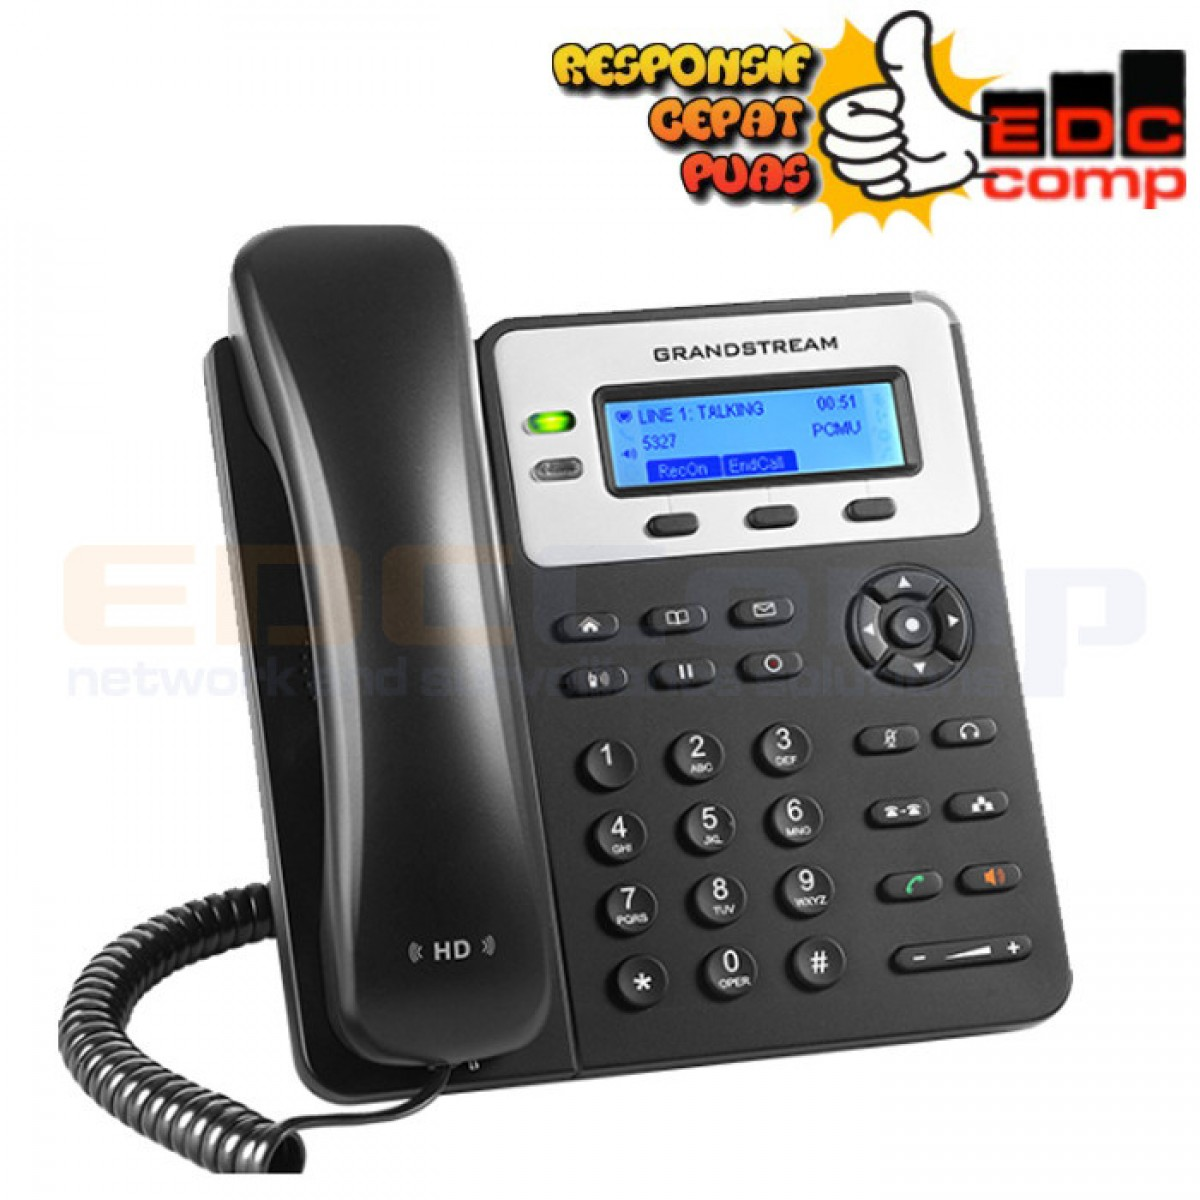 Grandstream GXP1625 IP Phone - IP Phone GXP1625 Grandstream - EdcComp